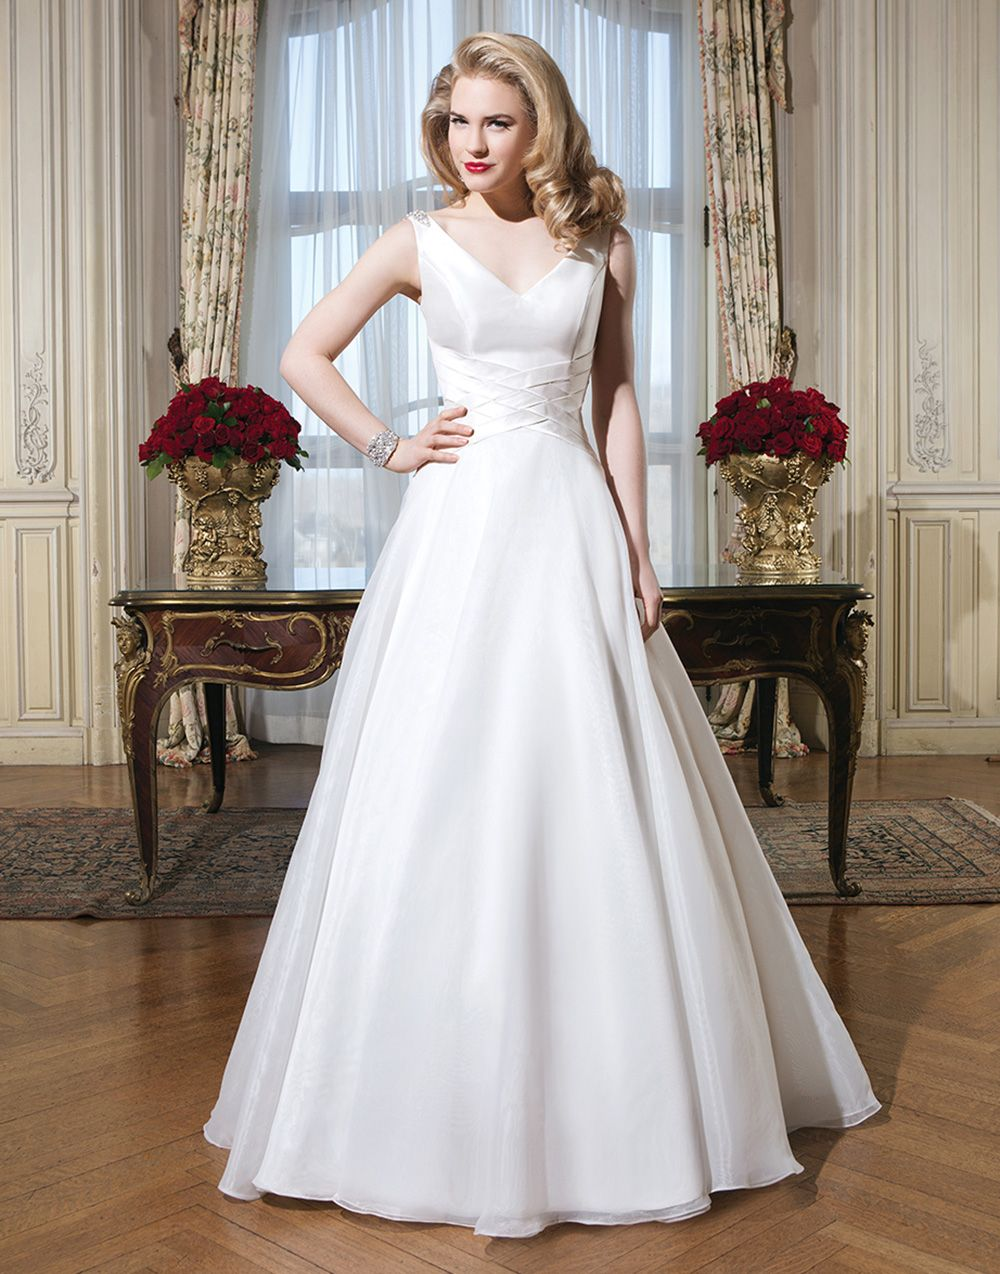 Justin alexander wedding dresses style organza silk dupion a